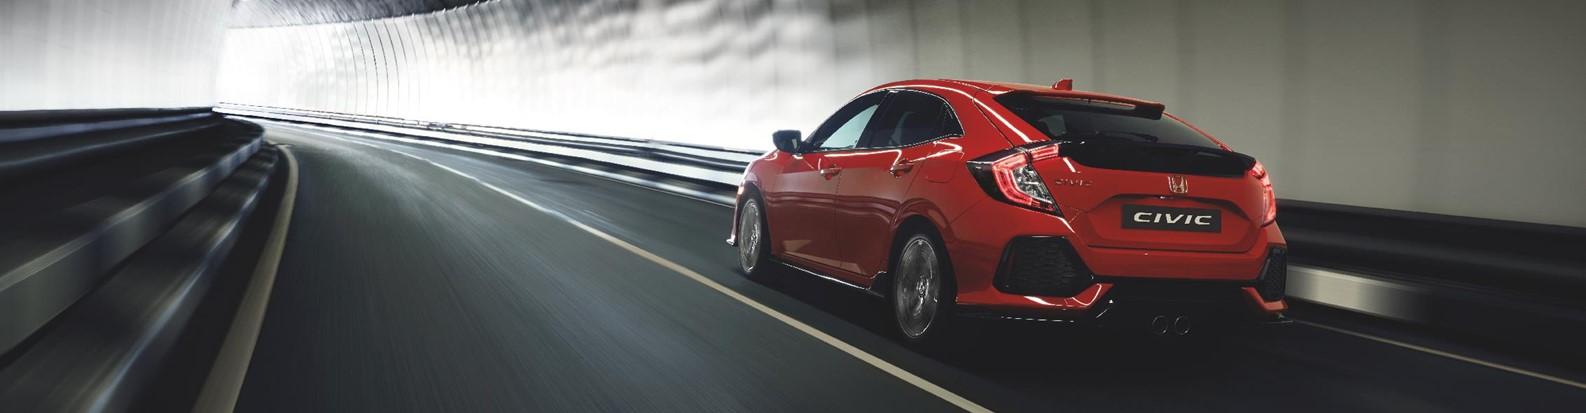 Honda – New Civic rear